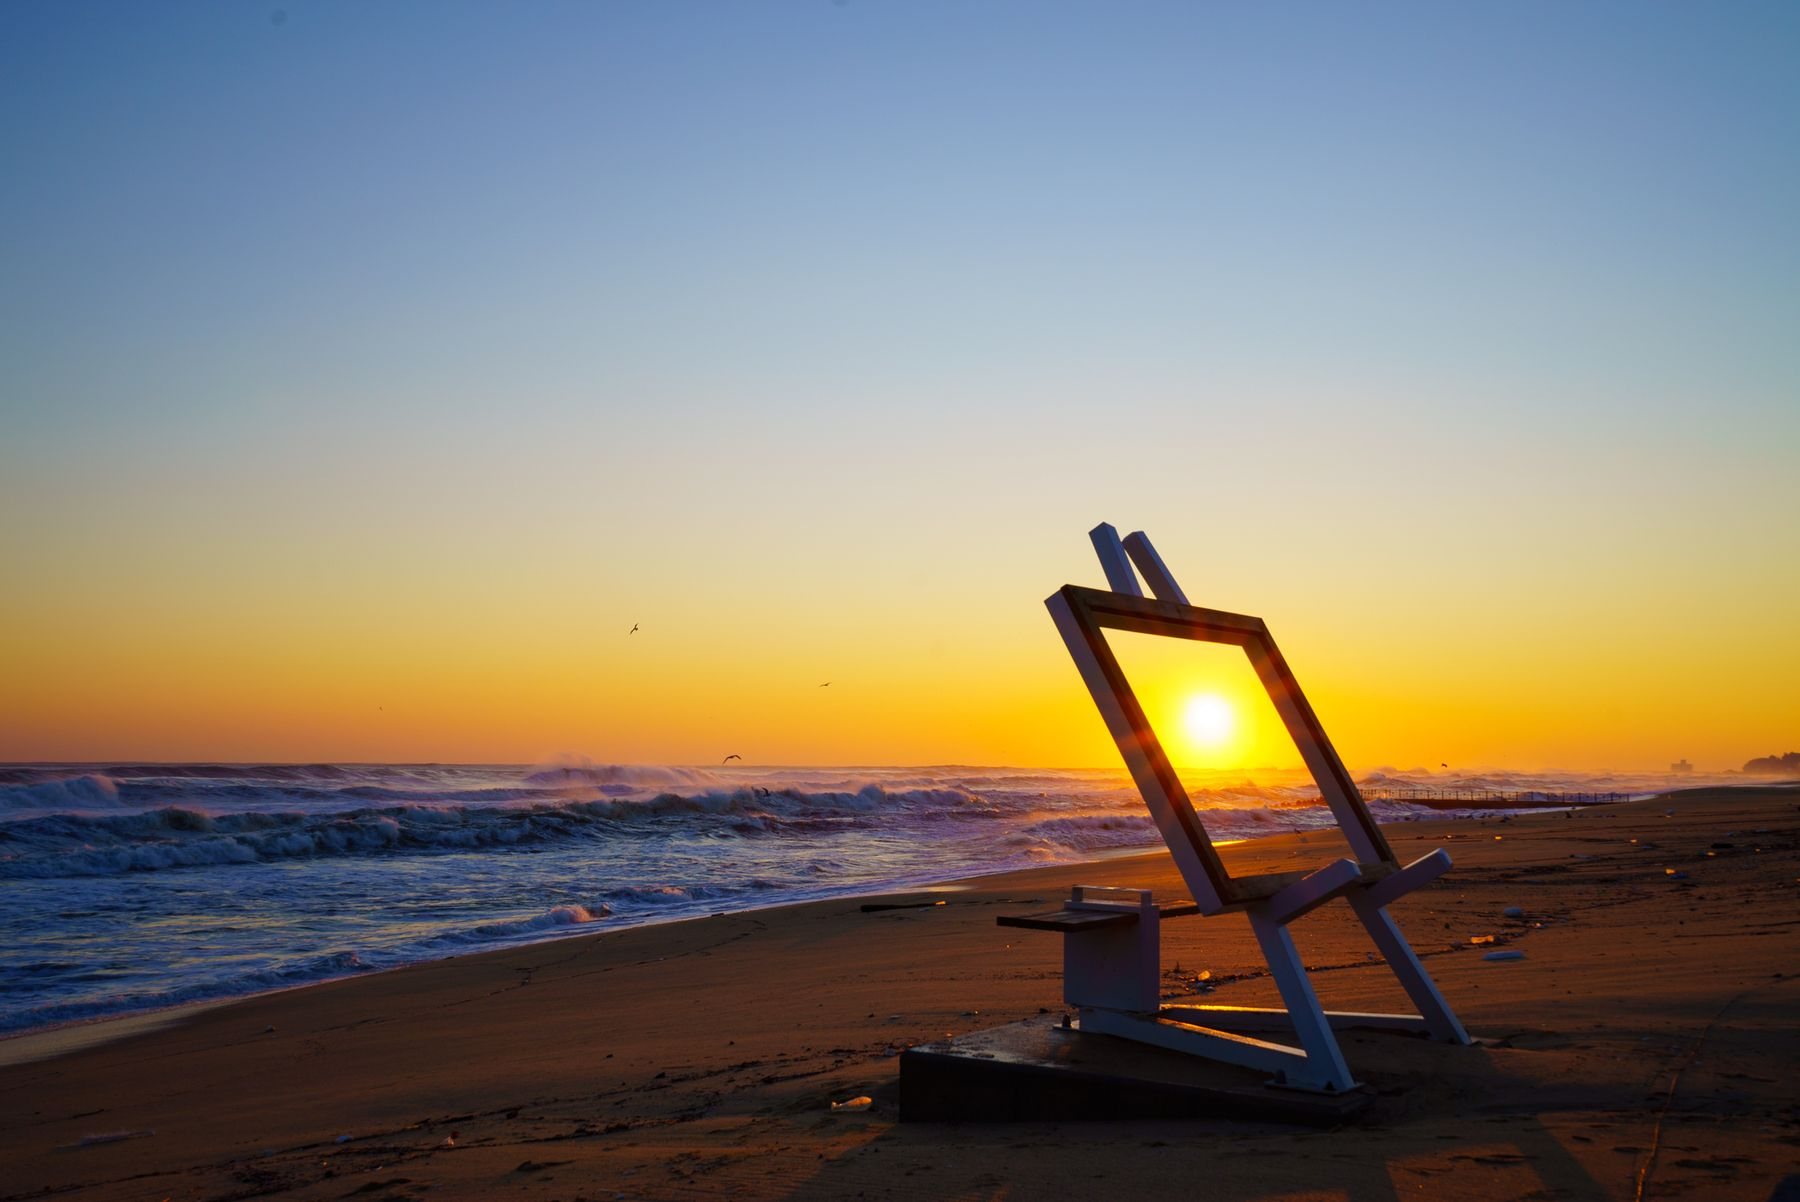 Mooie zonsondergang op het strand